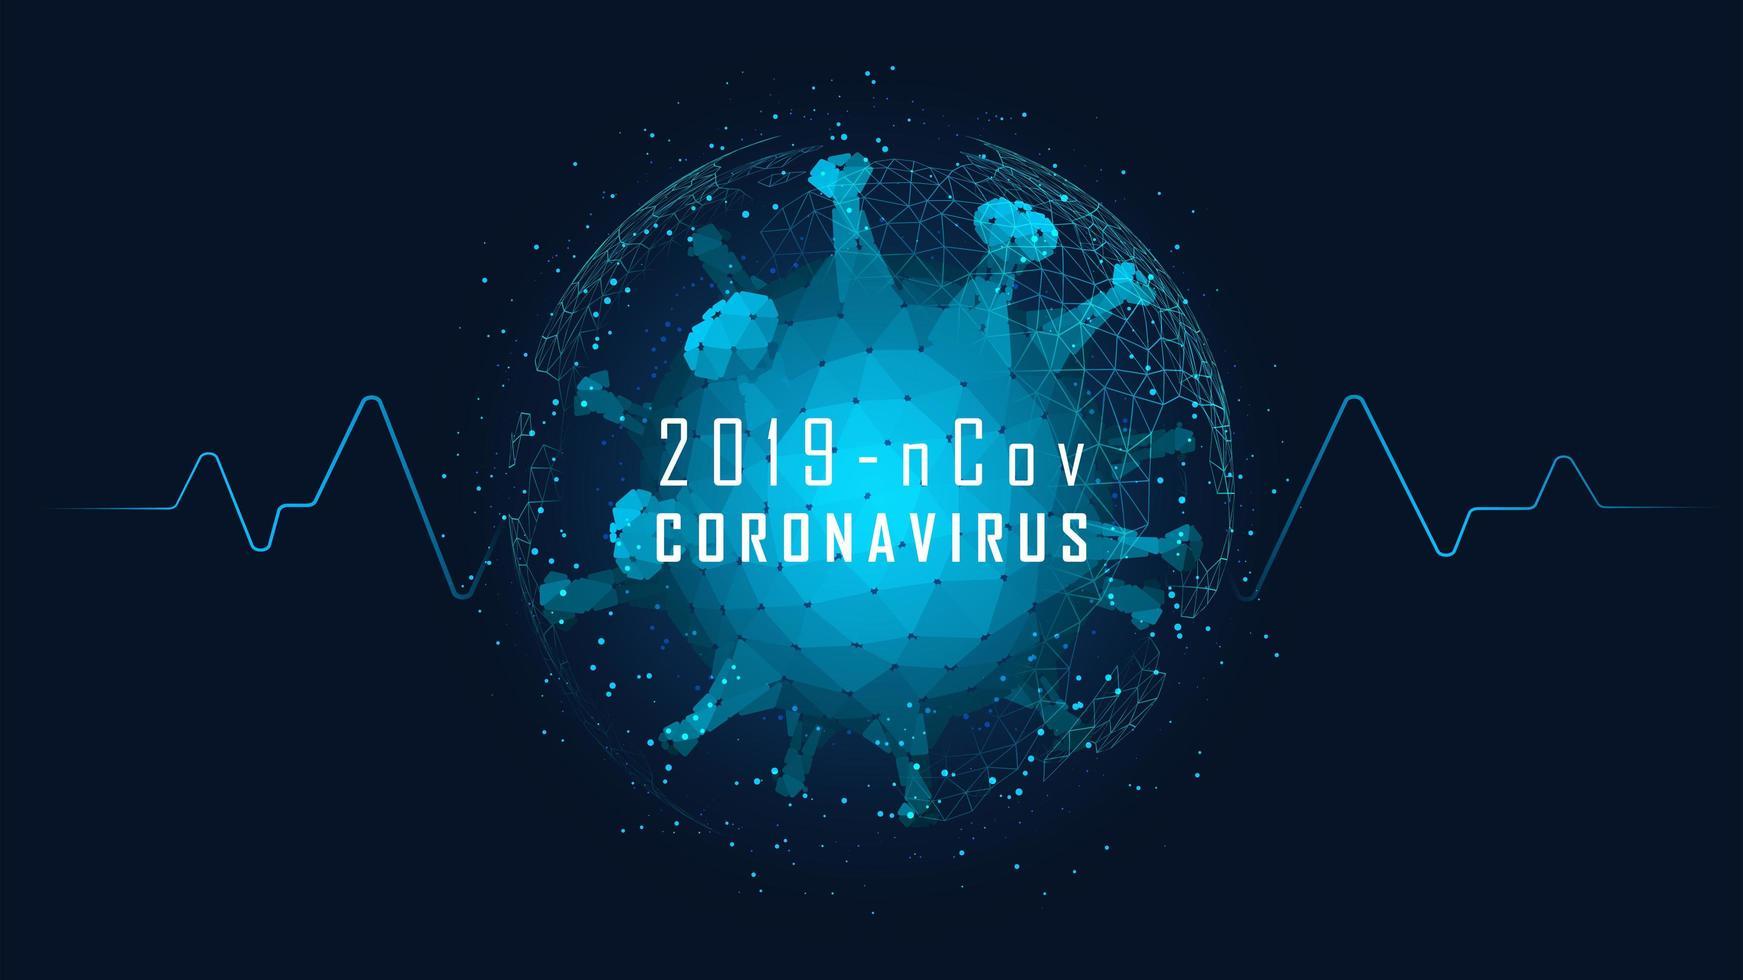 célula de coronavírus de baixo poli com símbolo de sinal de vida vetor